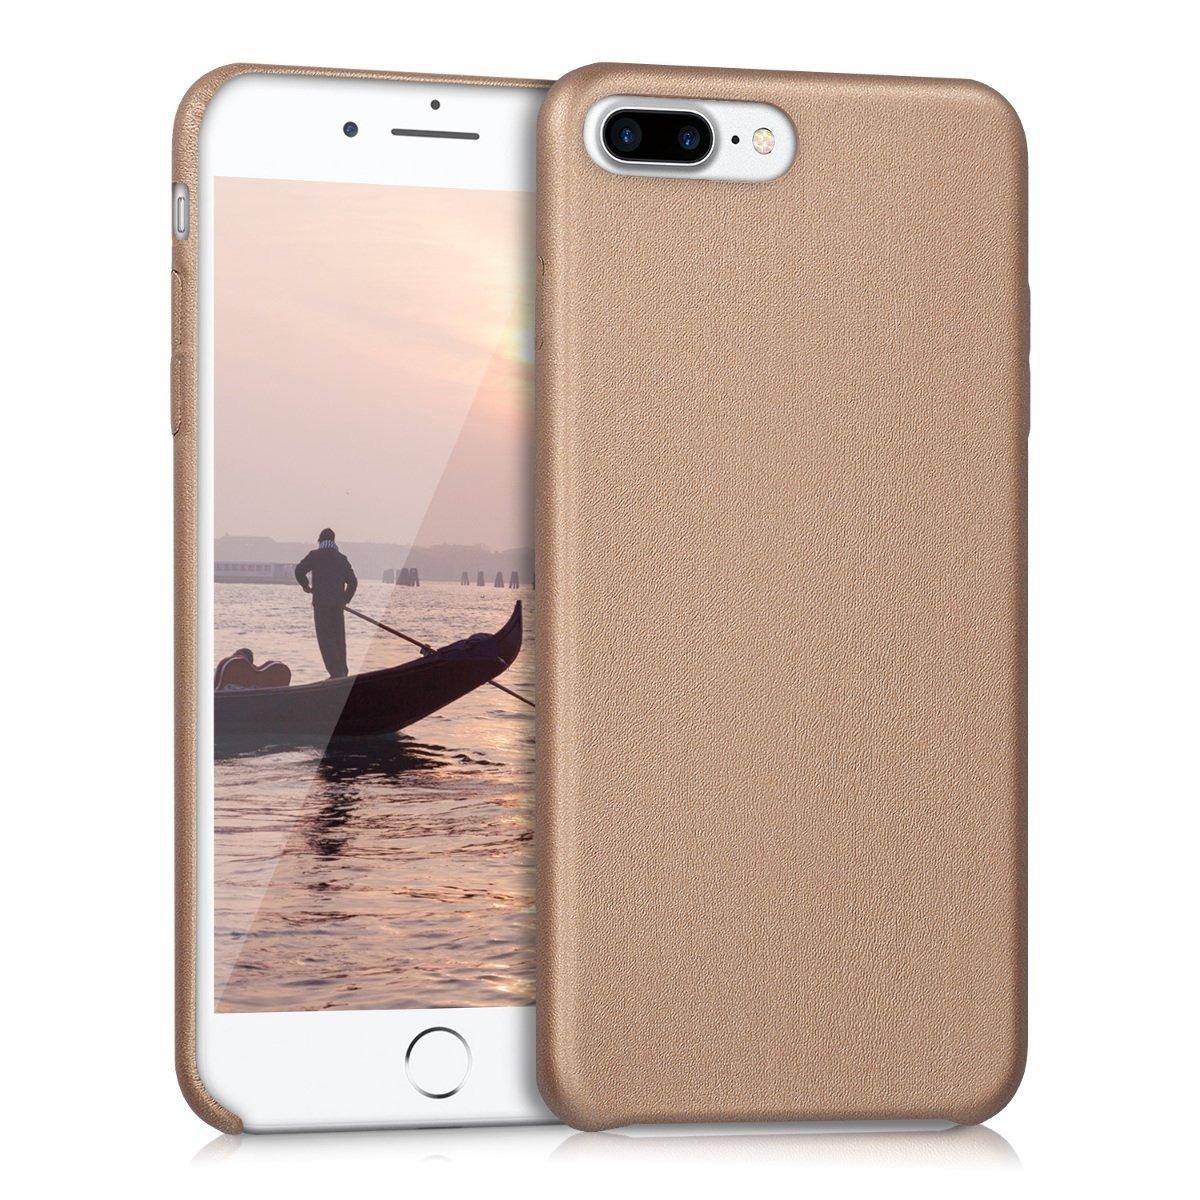 51b016b0872 kwmobile funda para apple iphone 7-plus / 8-plus - soft dura. Cargando zoom.